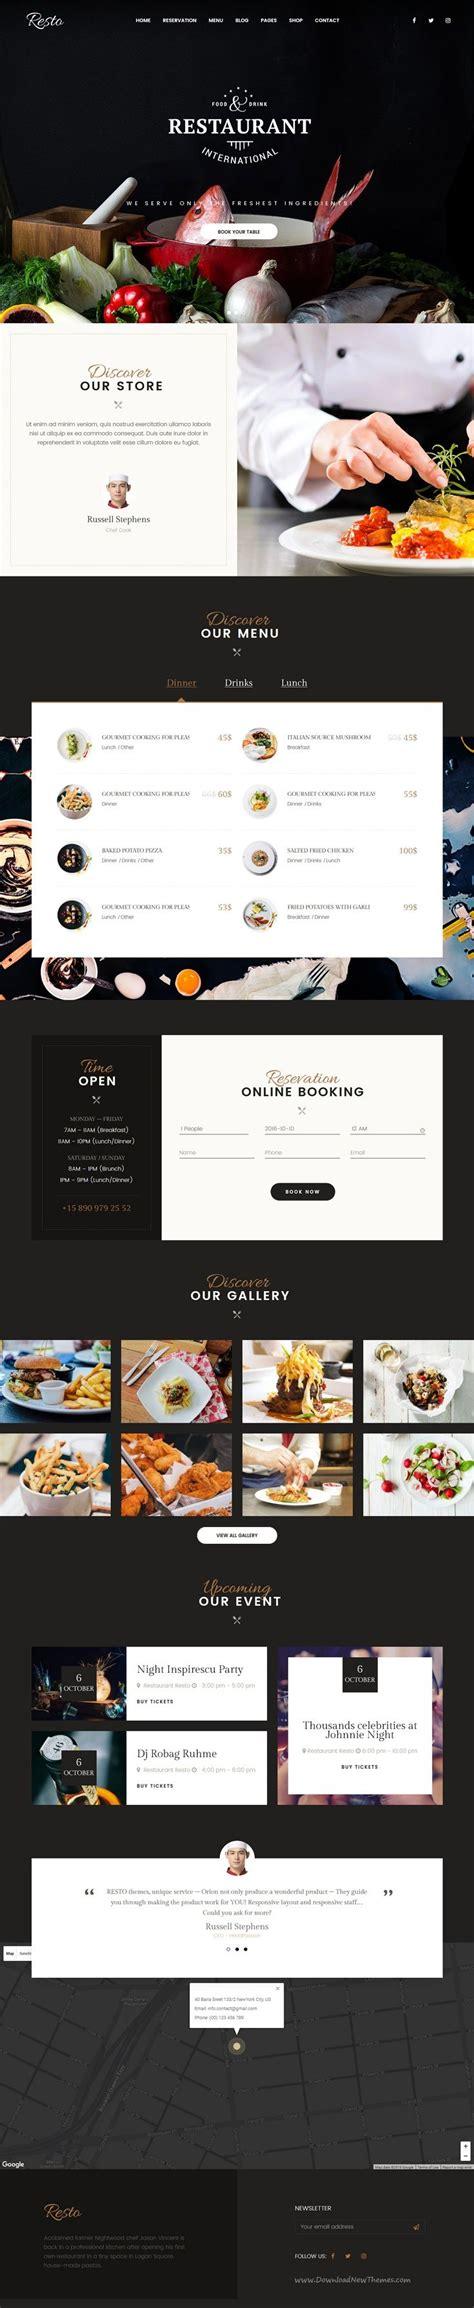 wordpress restaurant layout resto multipurpose restaurant cafe wordpress theme 웹